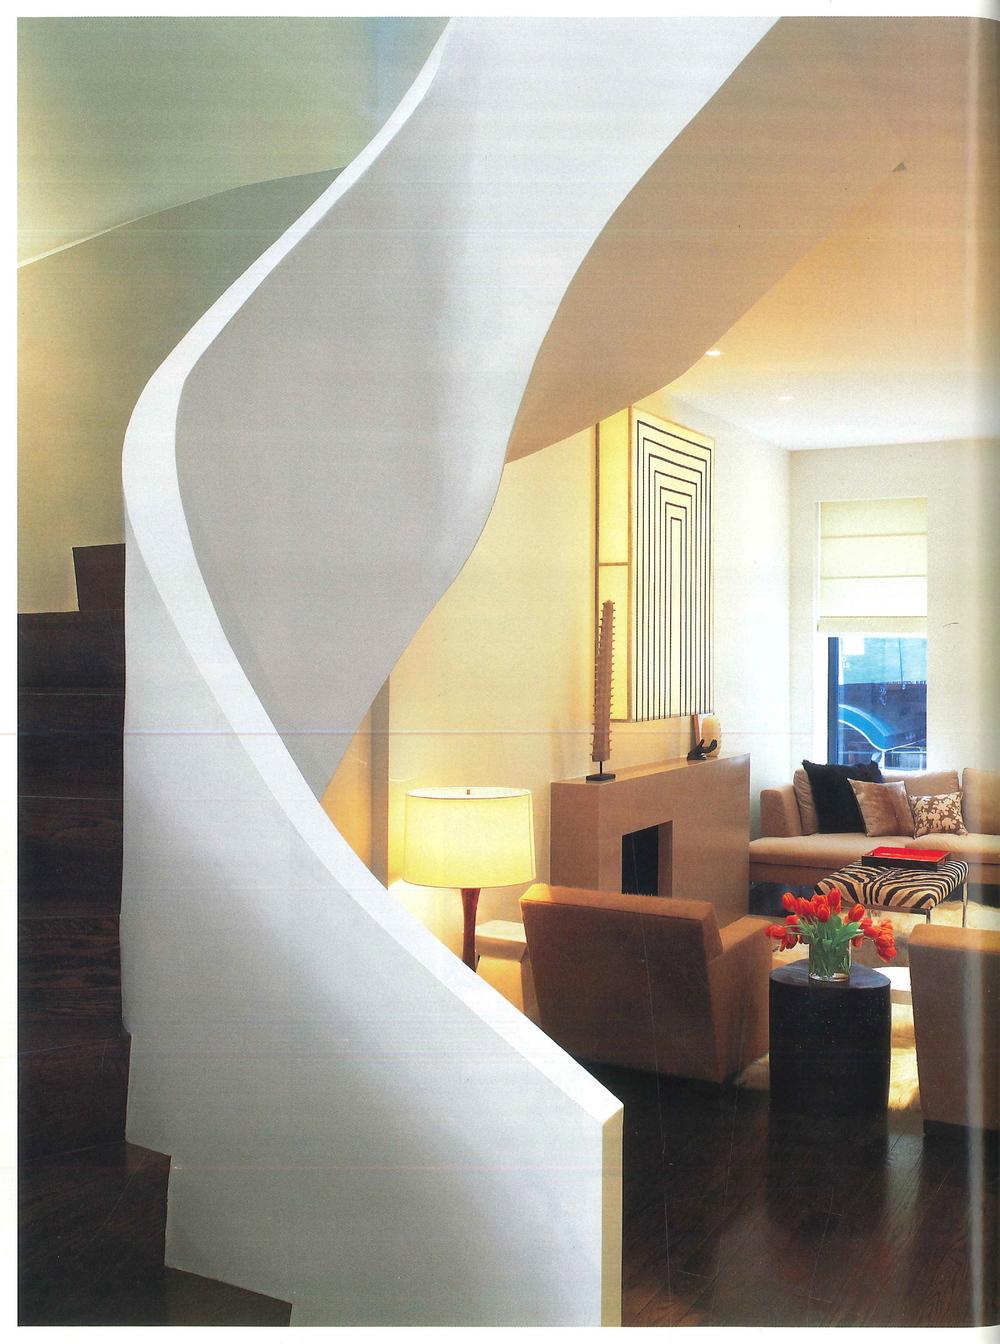 Interior Design Magazine_Nov 2008-5.jpg